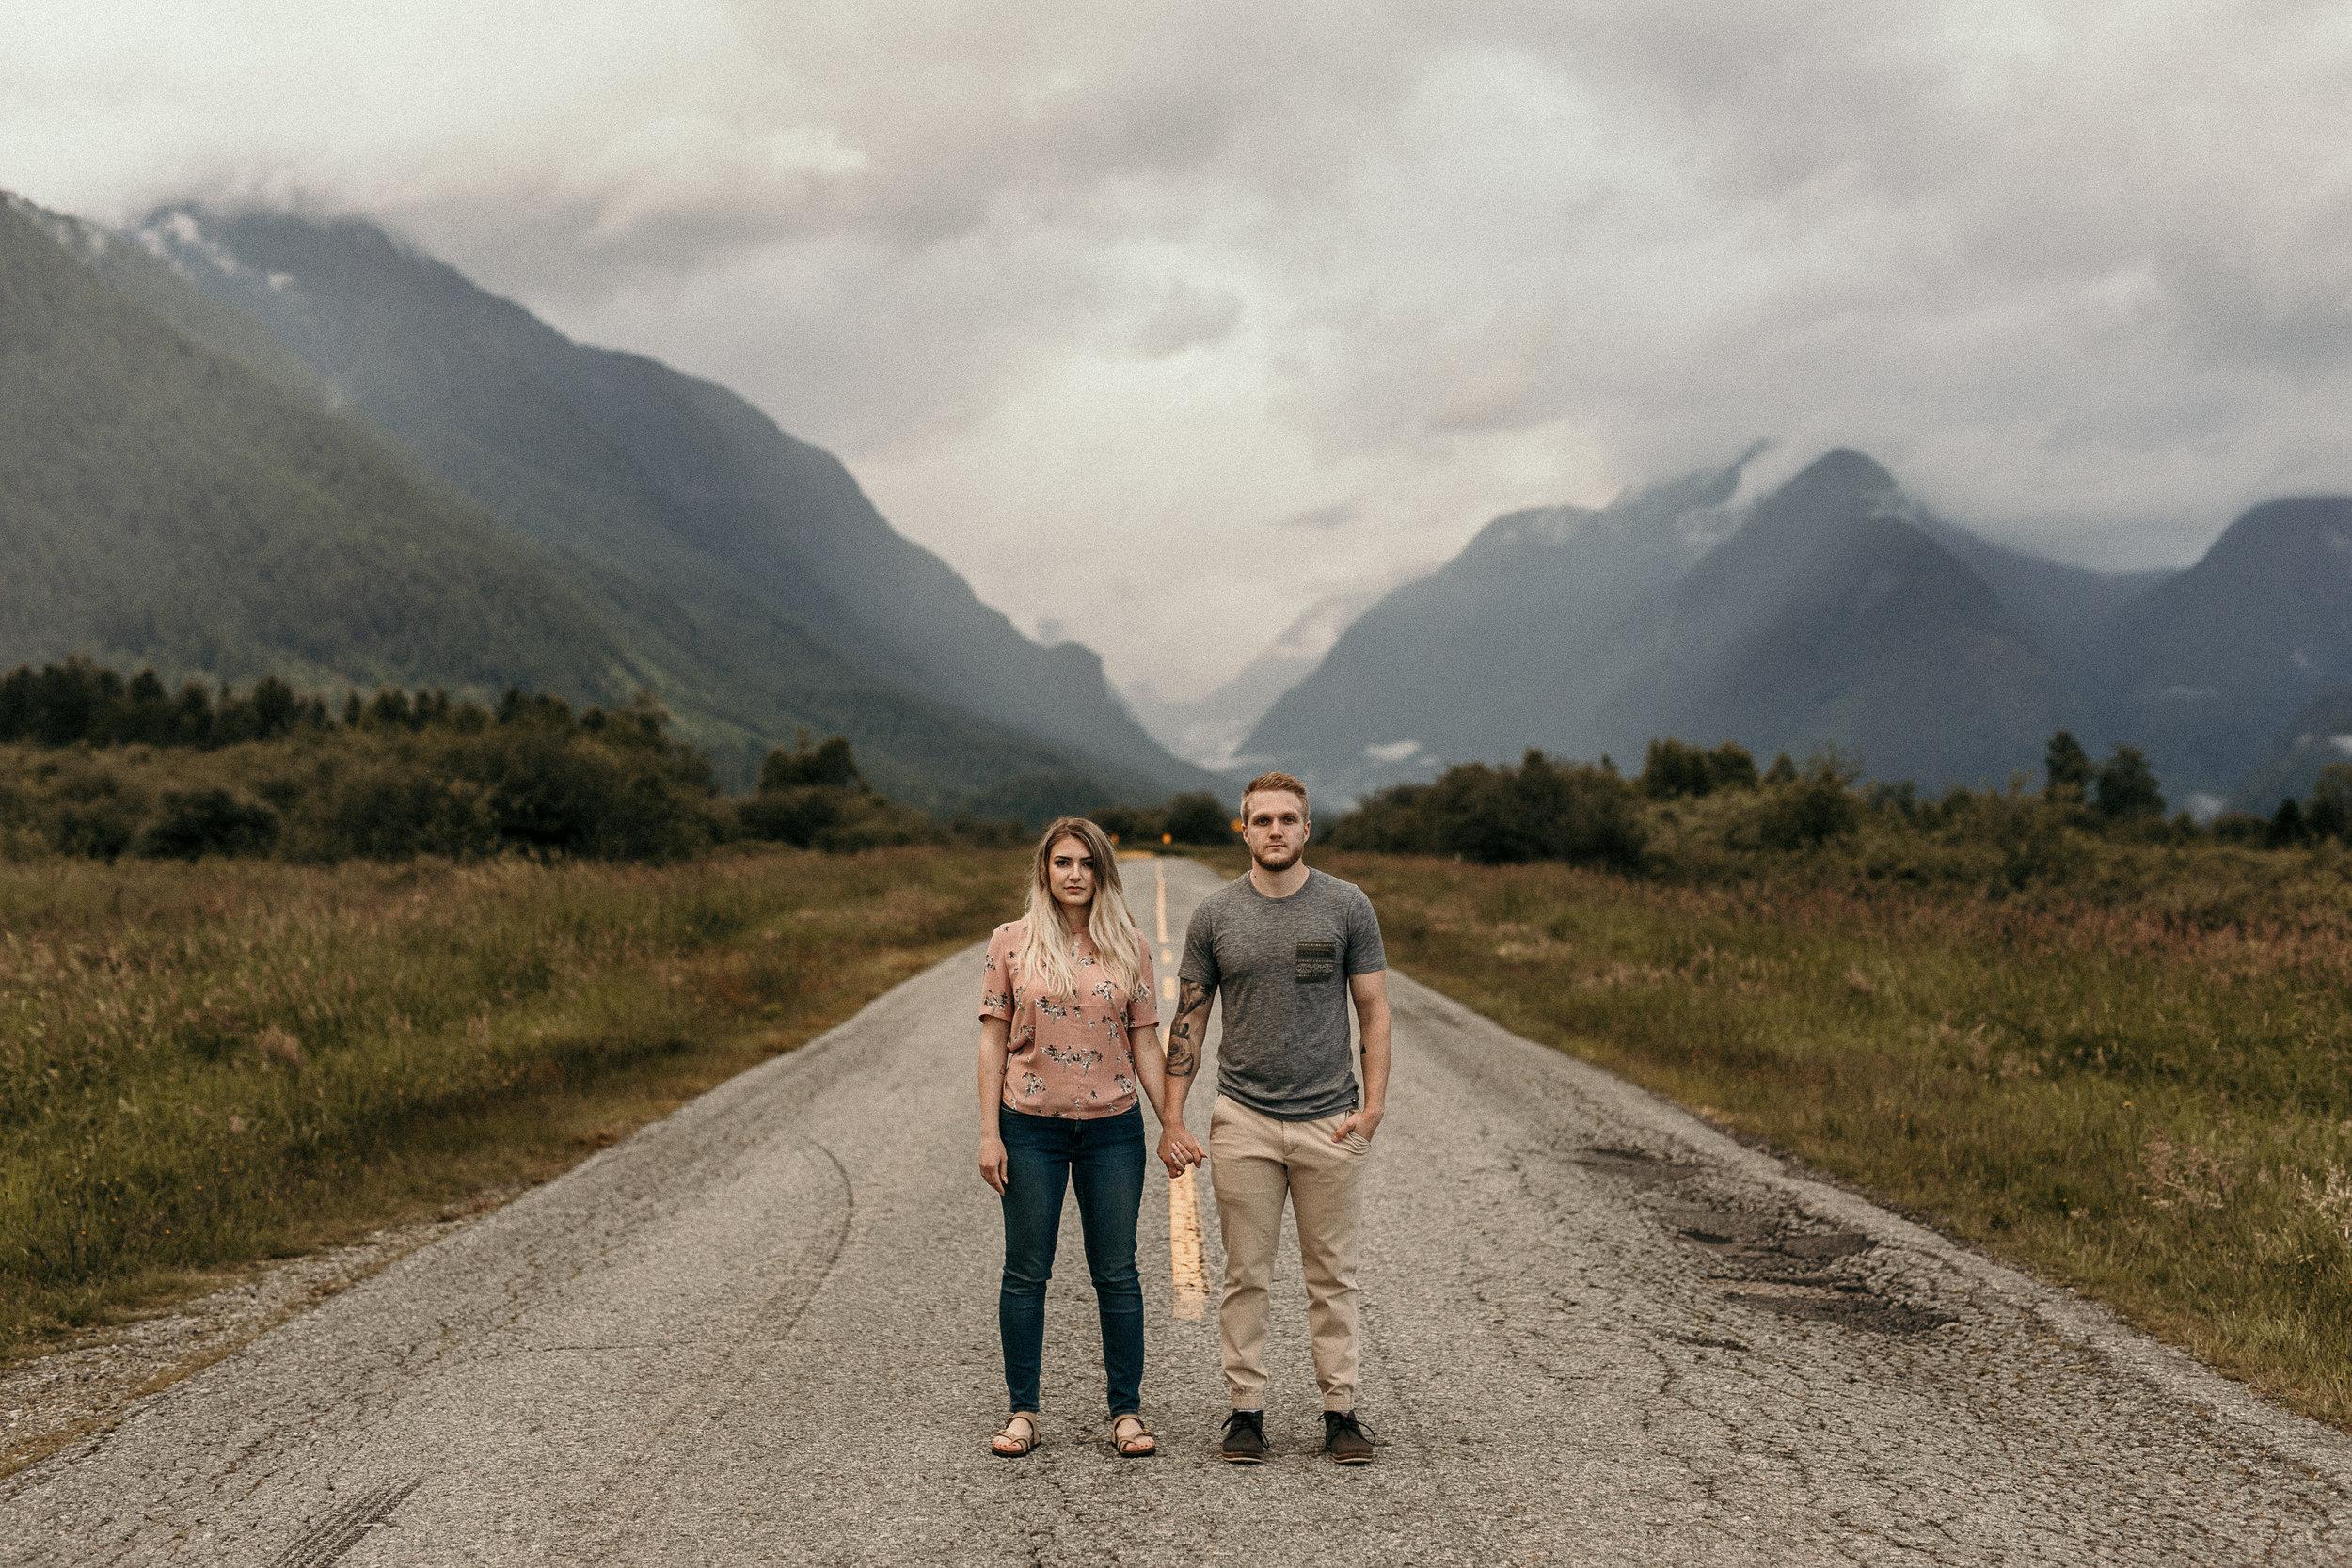 WEDDING,ADVENTURE,LIFESTYLE - photograhy